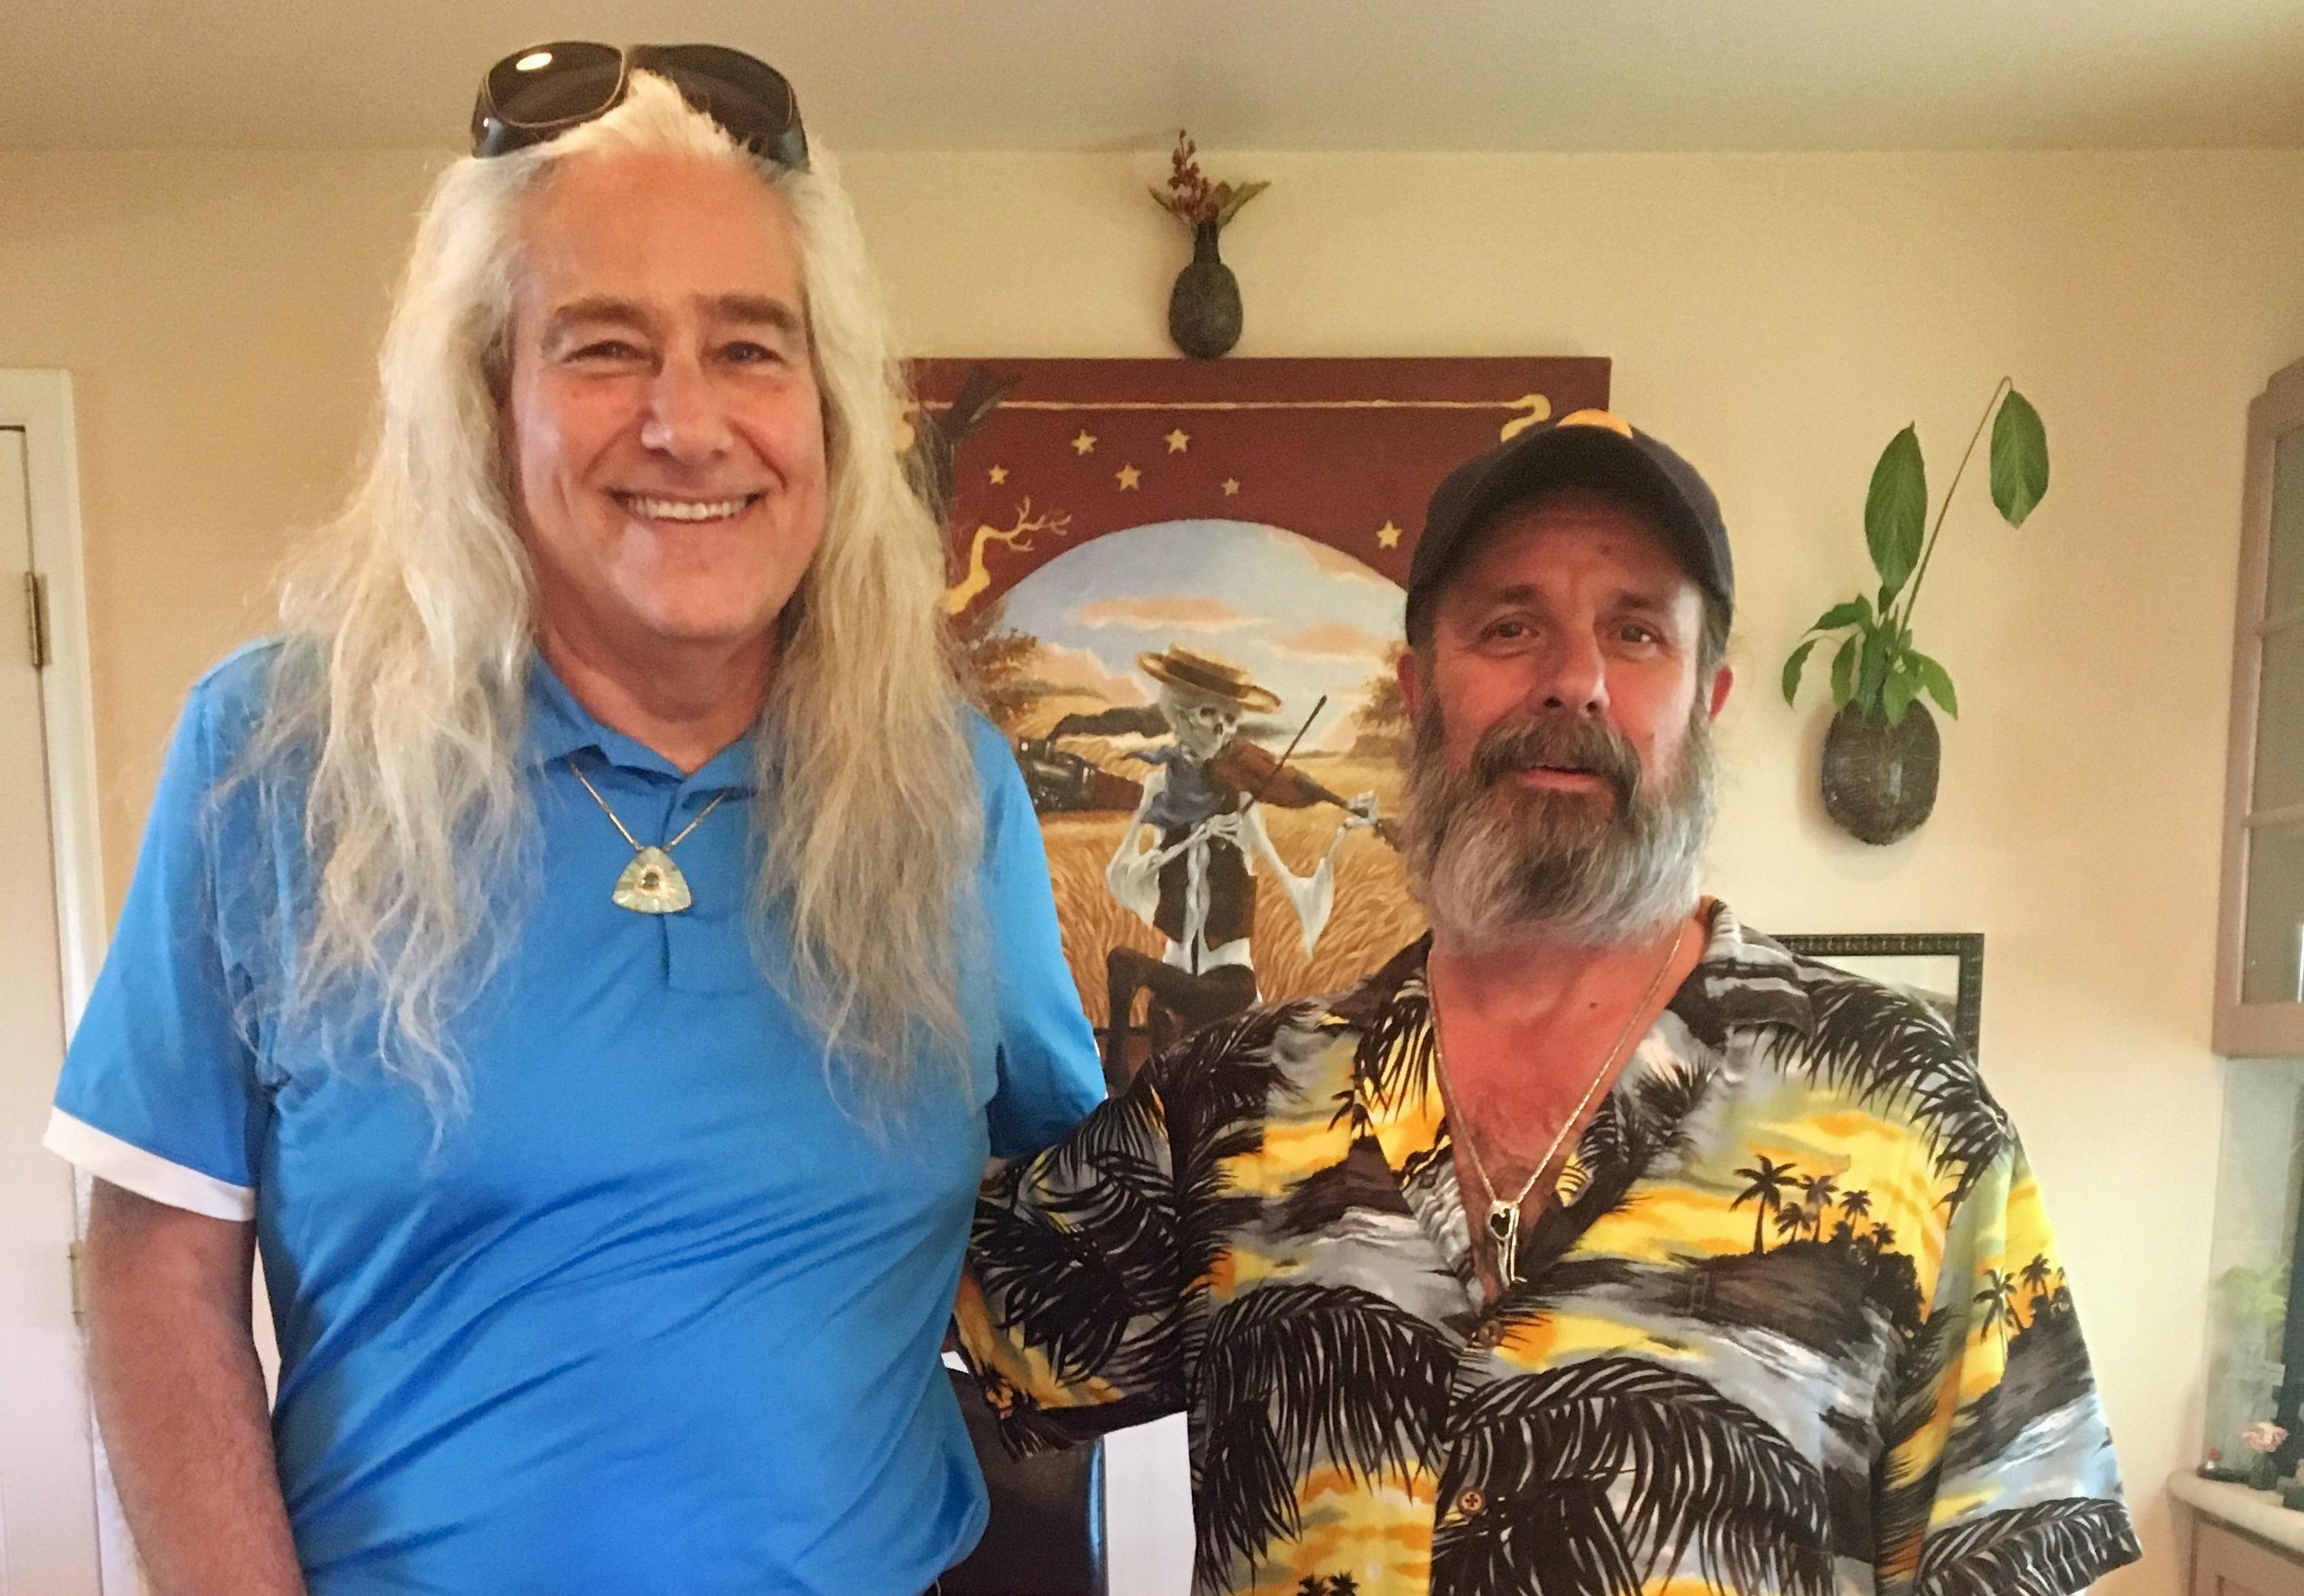 Silversmith David R. Freeland, Jr. & Richard Biffle